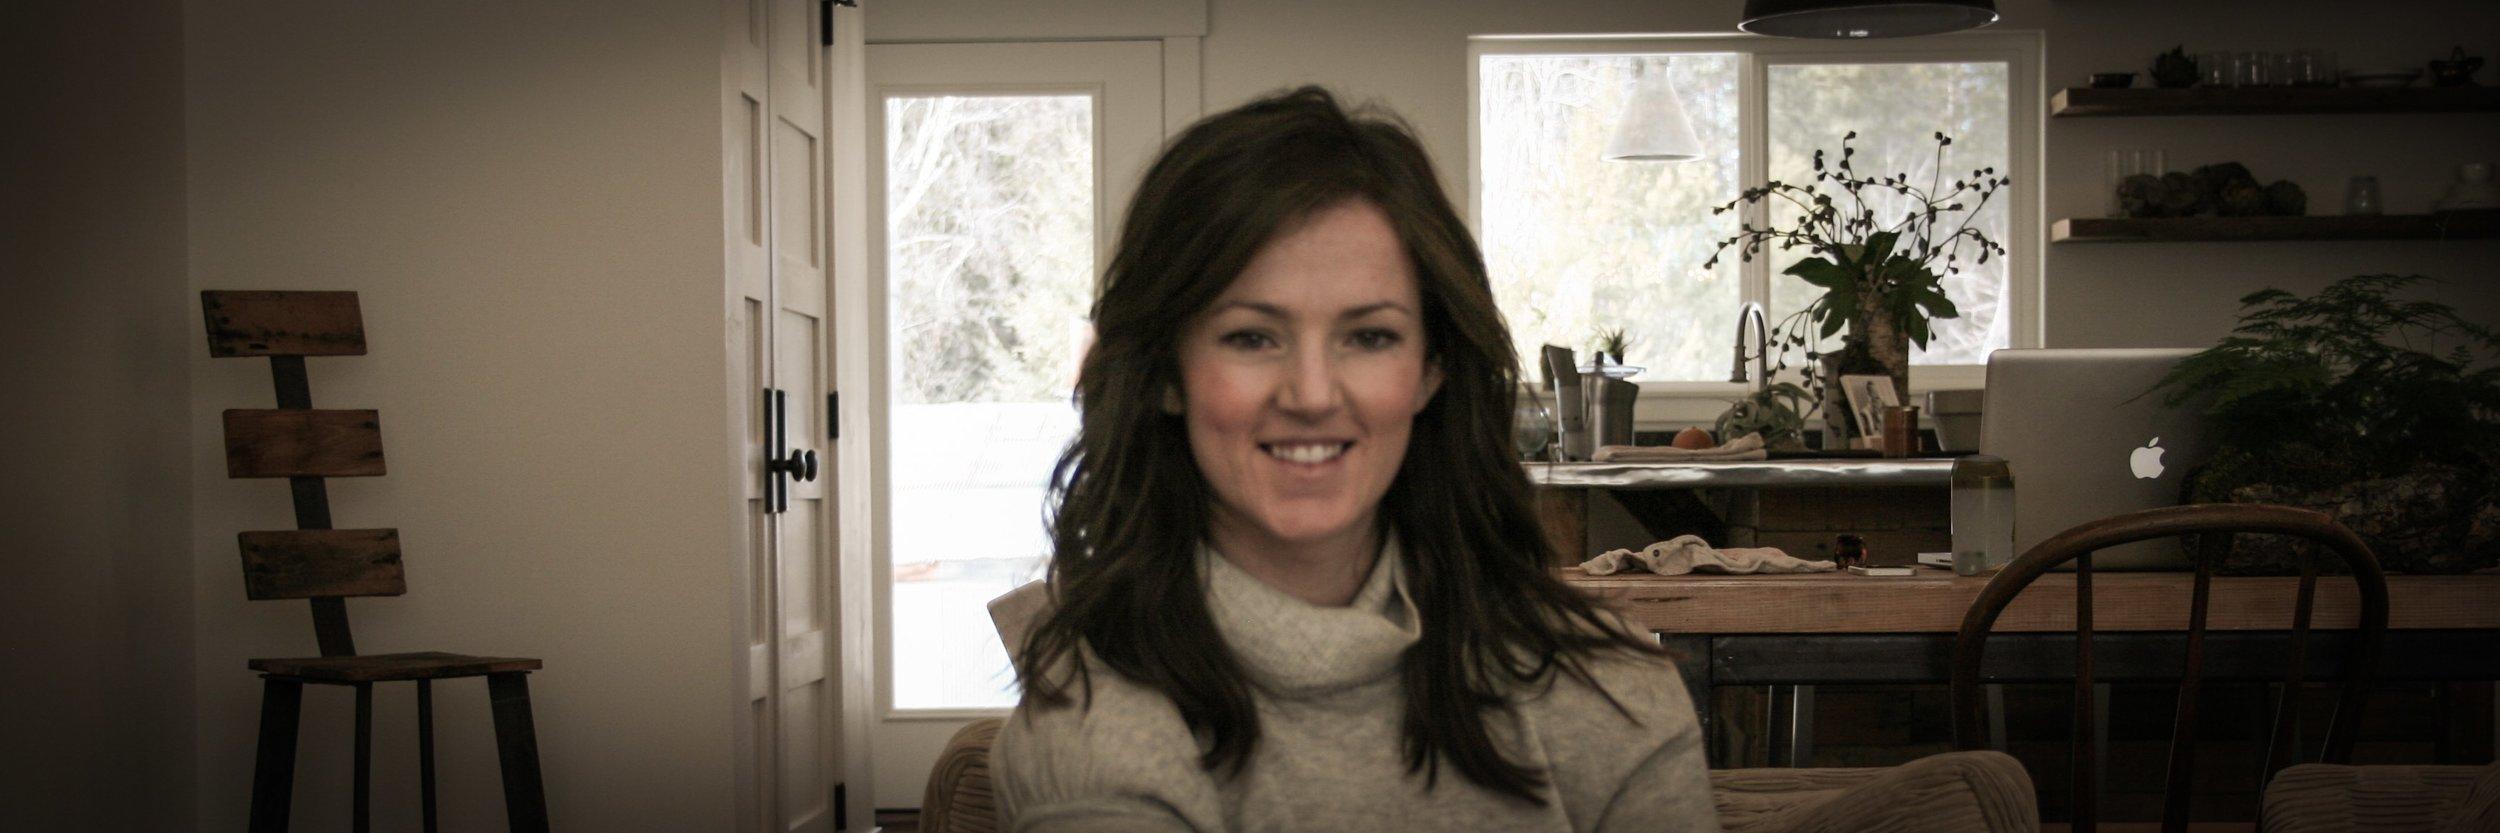 Madeline Boyle - Creative Director Since 2011